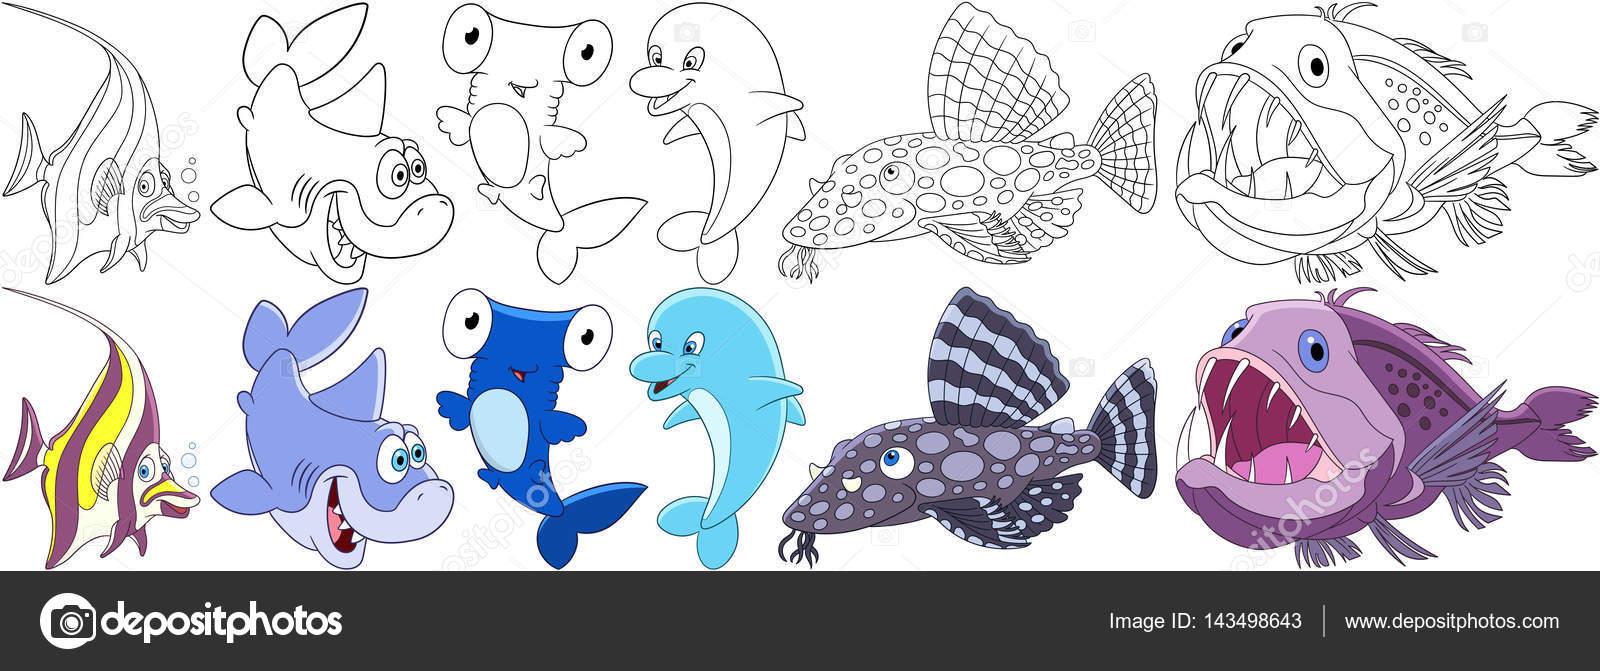 Cartoon-Unterwasserlebewesen-Satz — Stockvektor © Sybirko #143498643